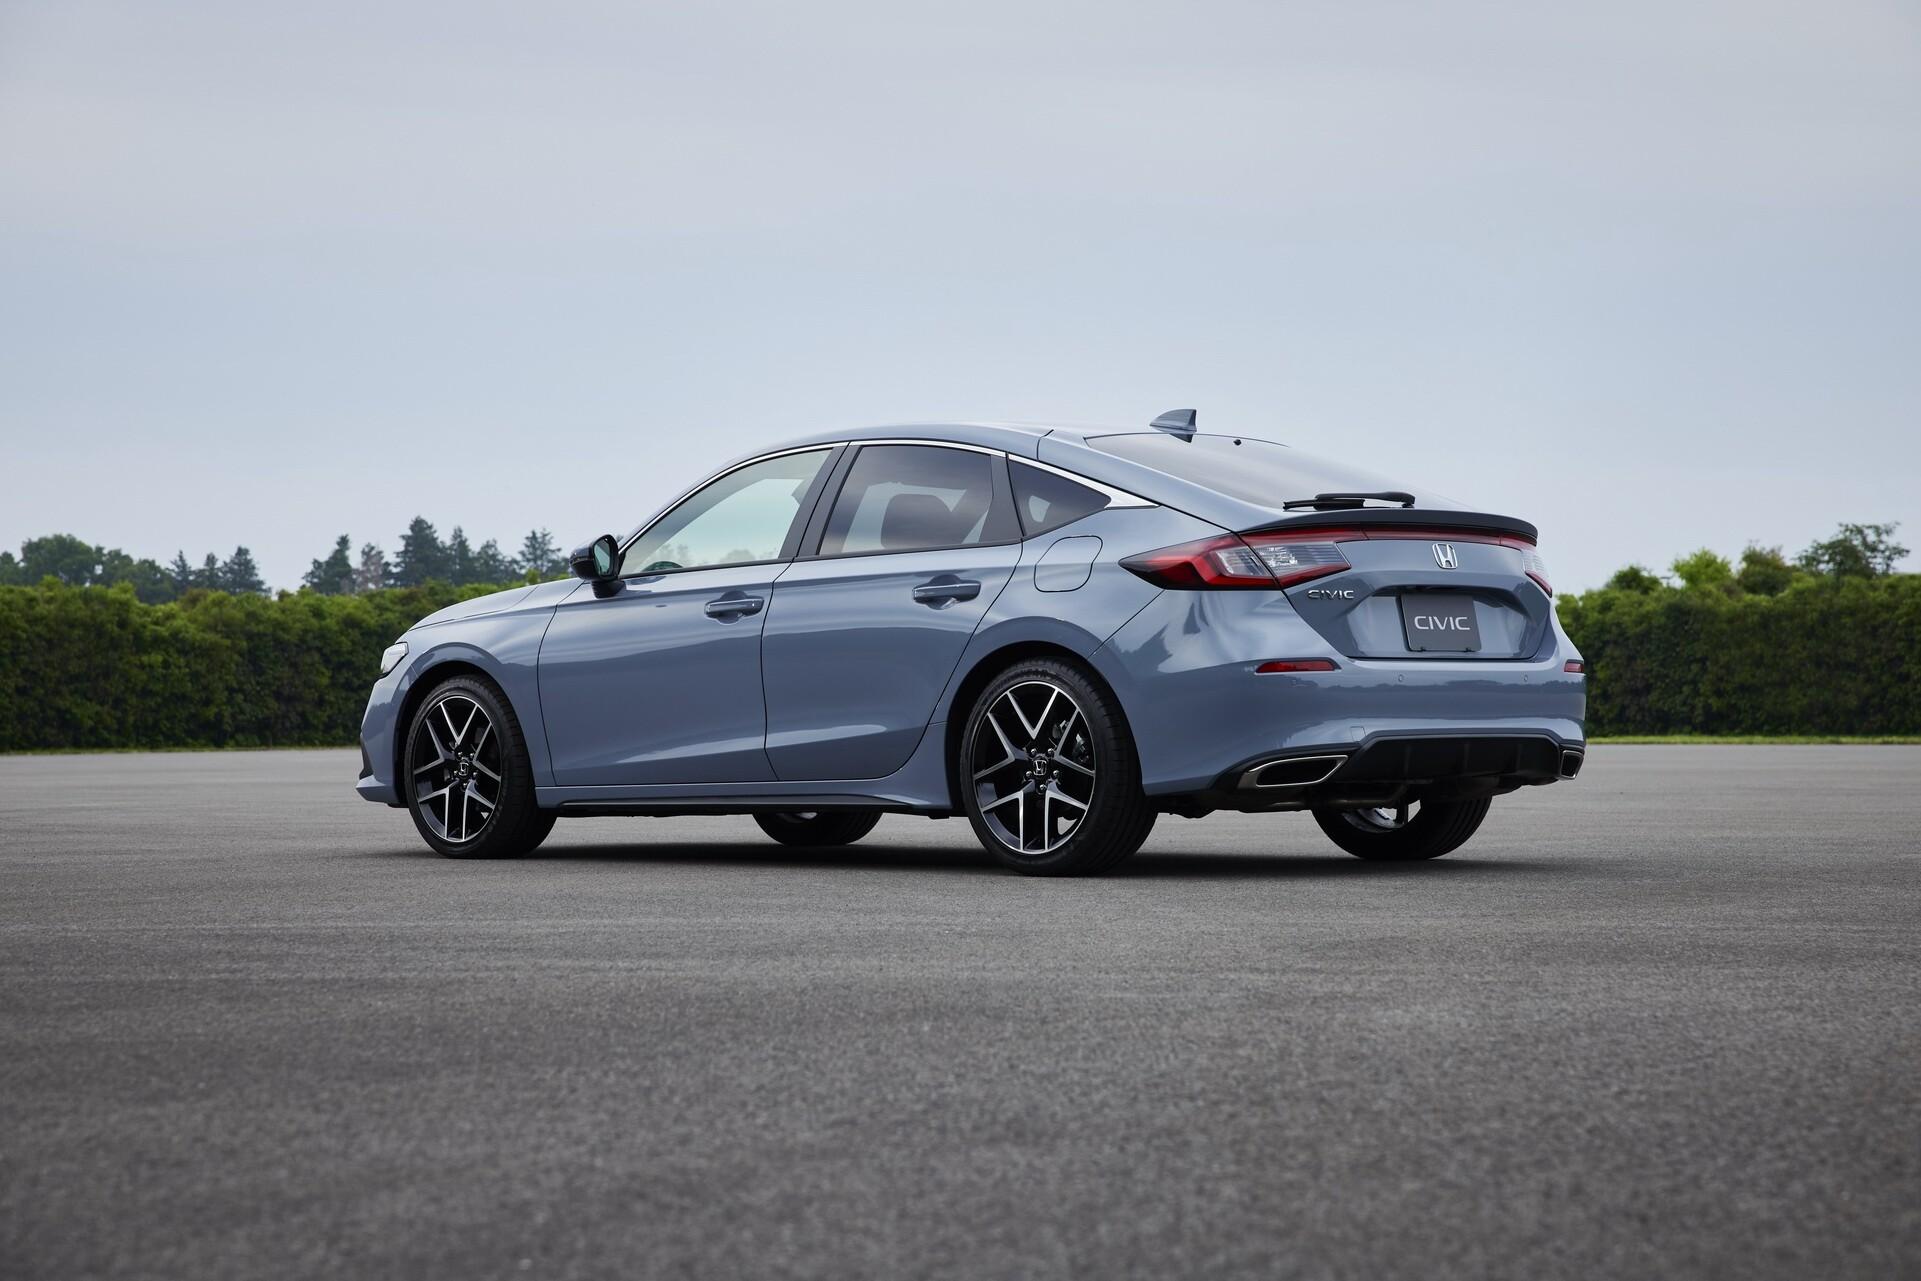 Foto de Honda Civic Hatchback 2022 (9/18)